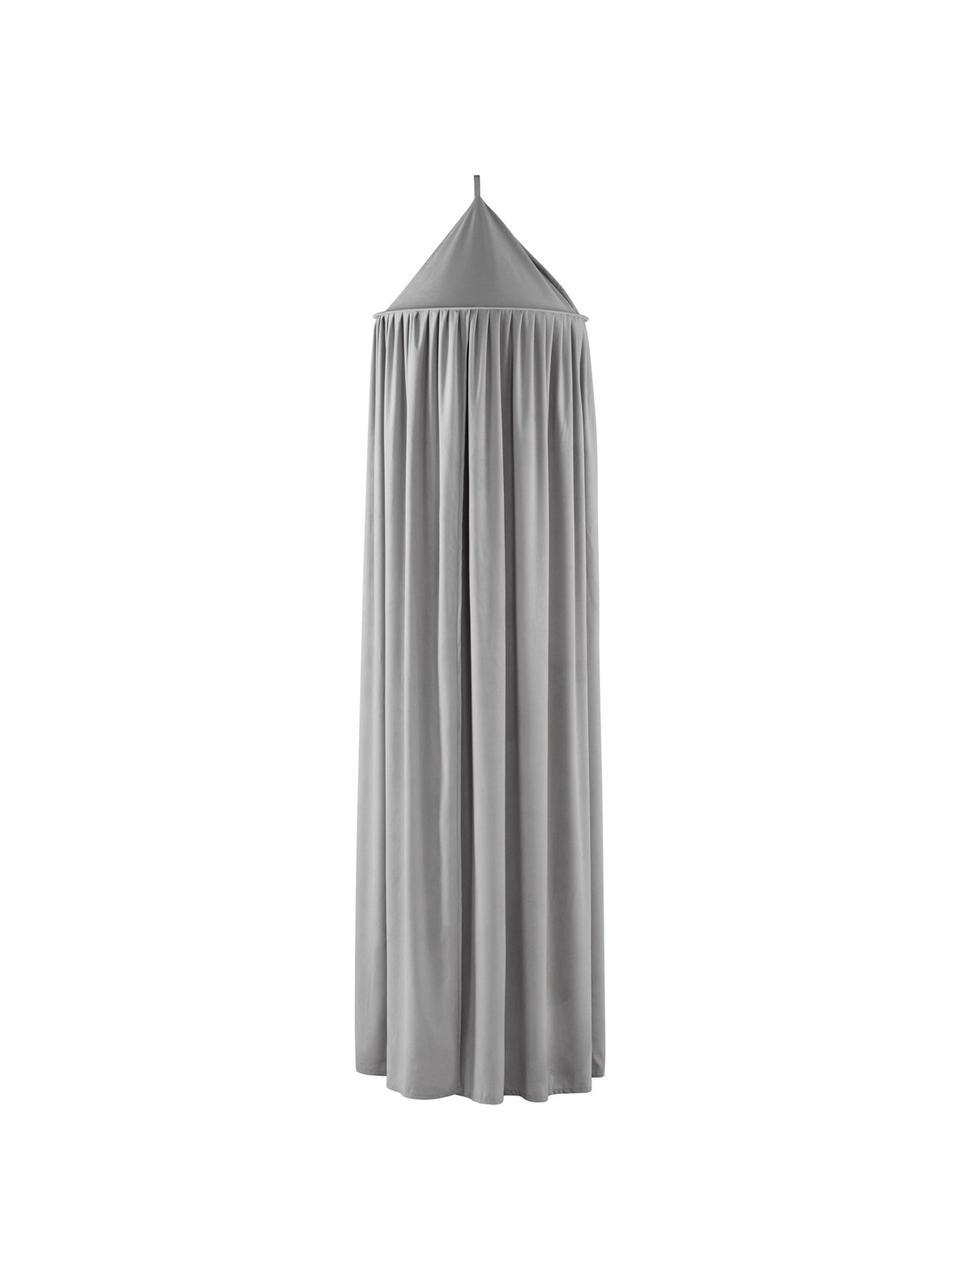 Betthimmel Savannah, Polyester., Grau, Ø 55 x 240 cm